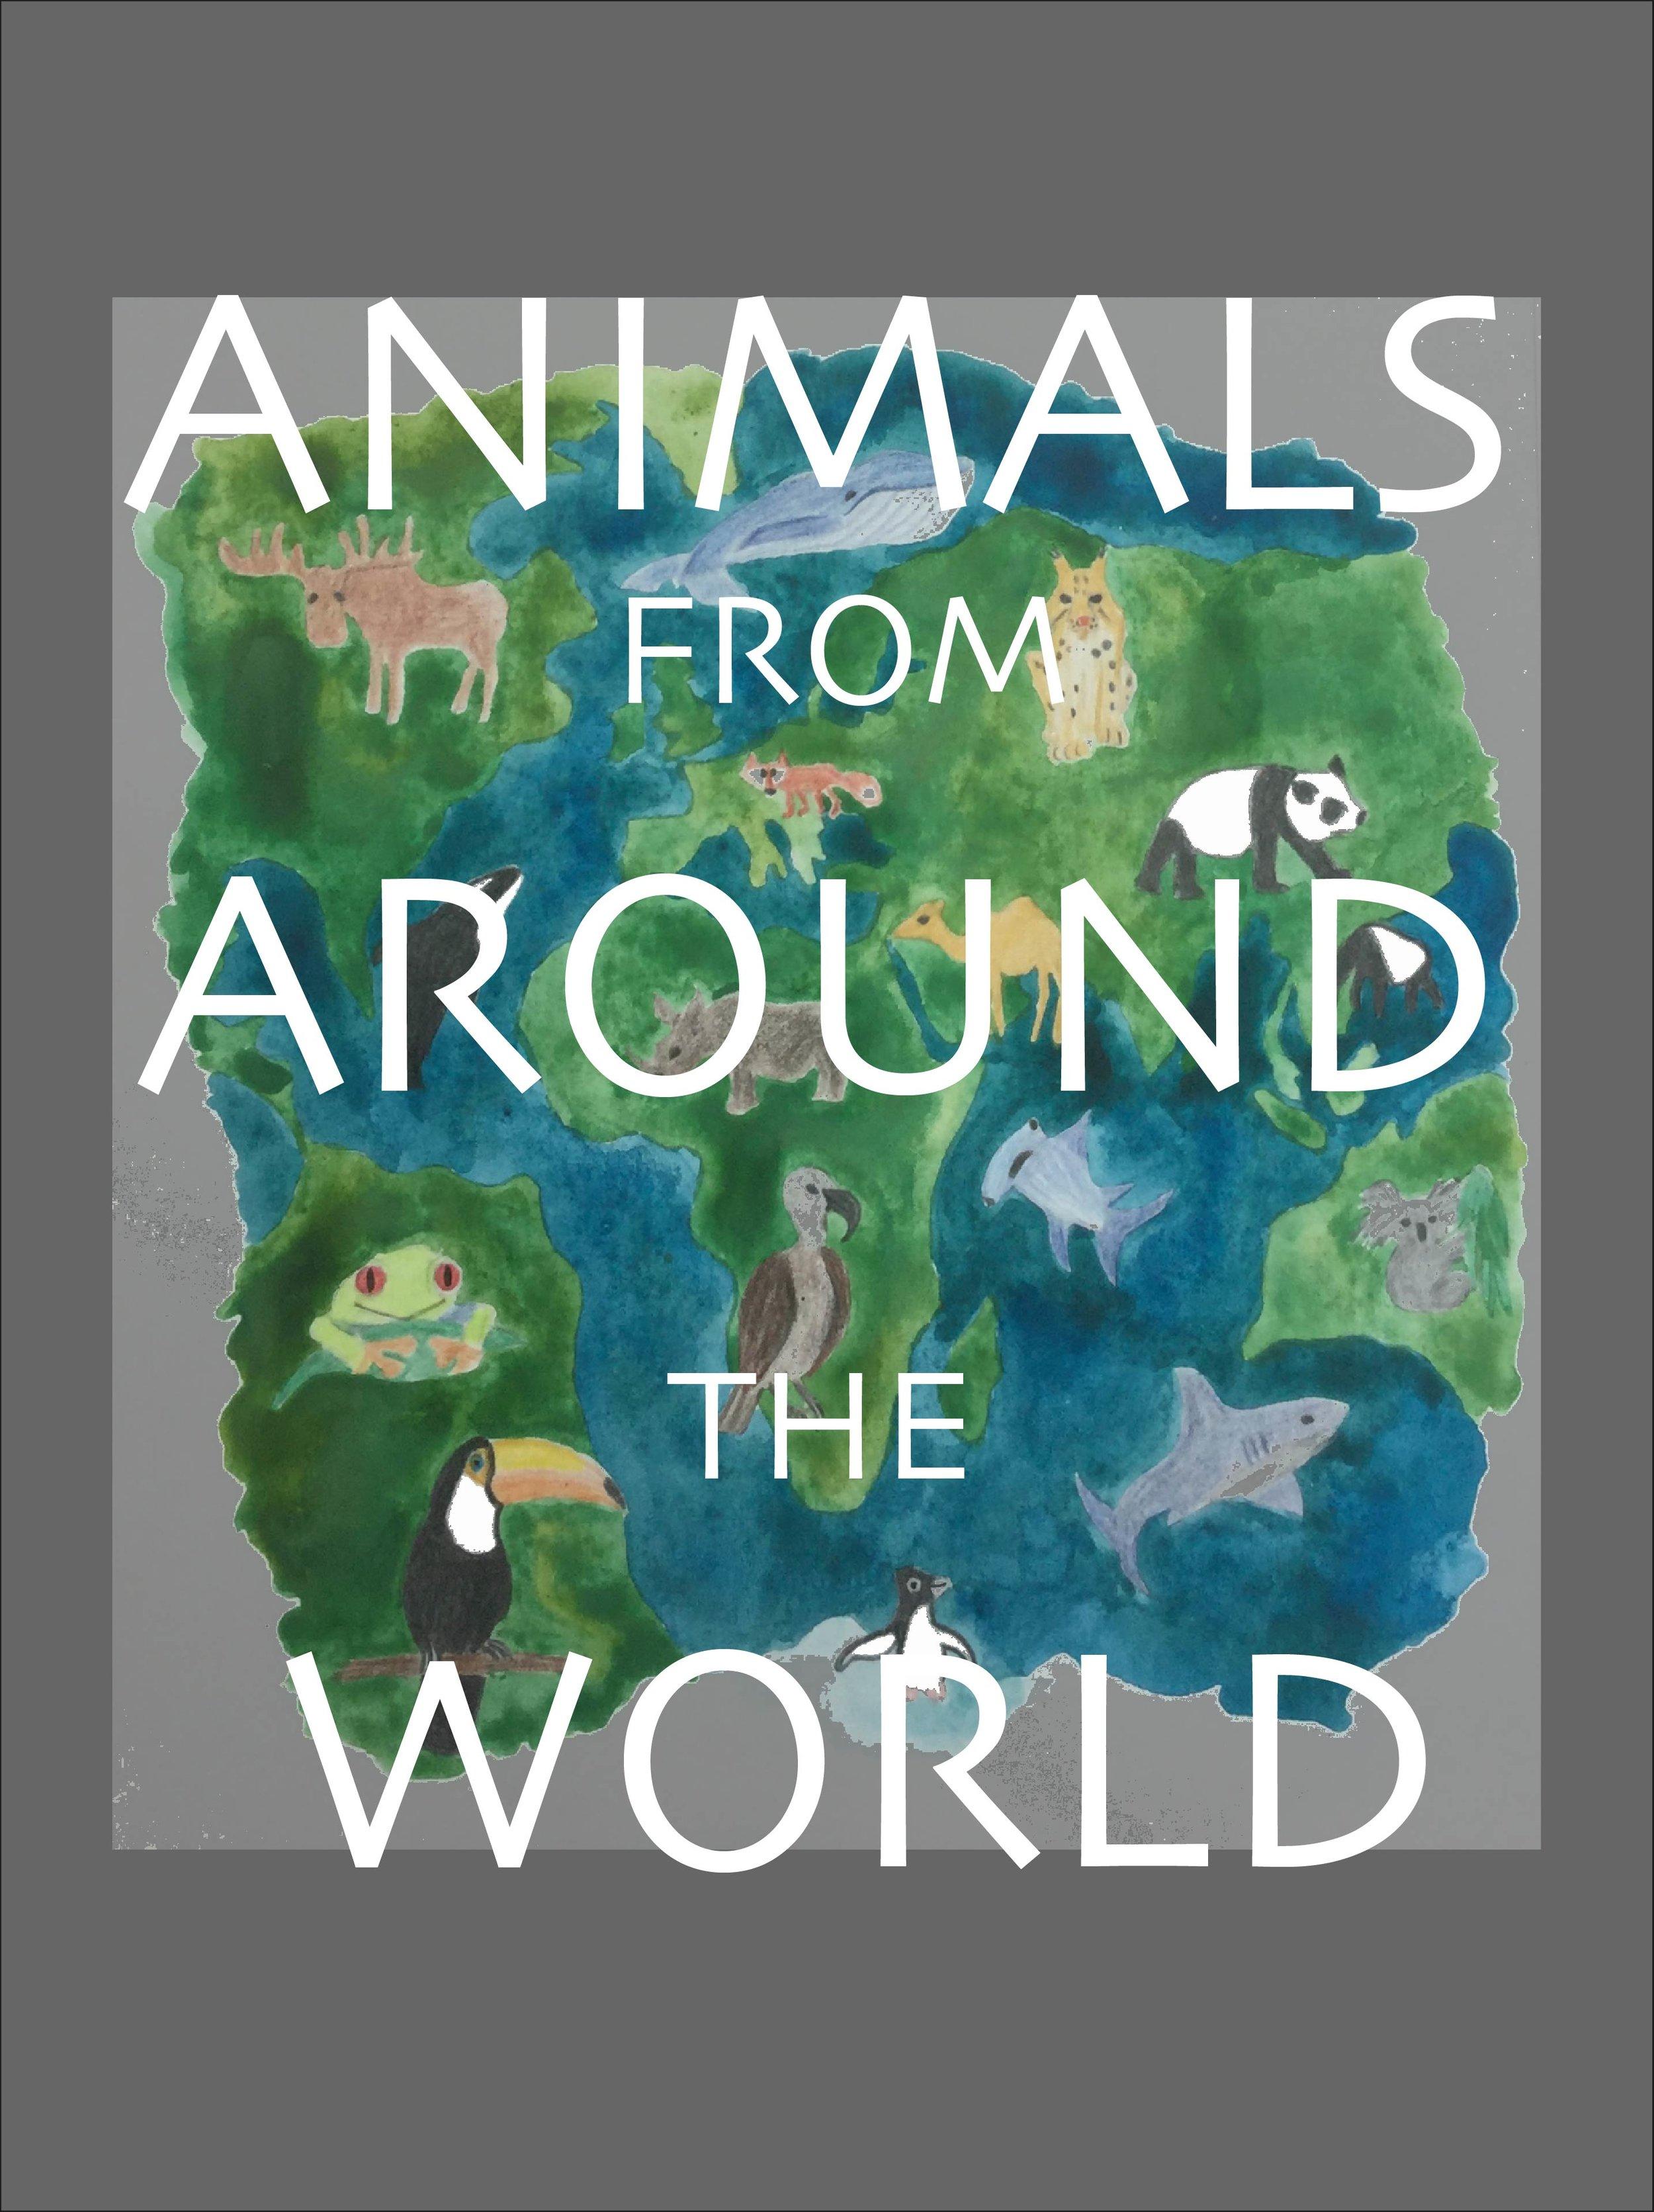 ANIMAL COVER 2F-01.jpg